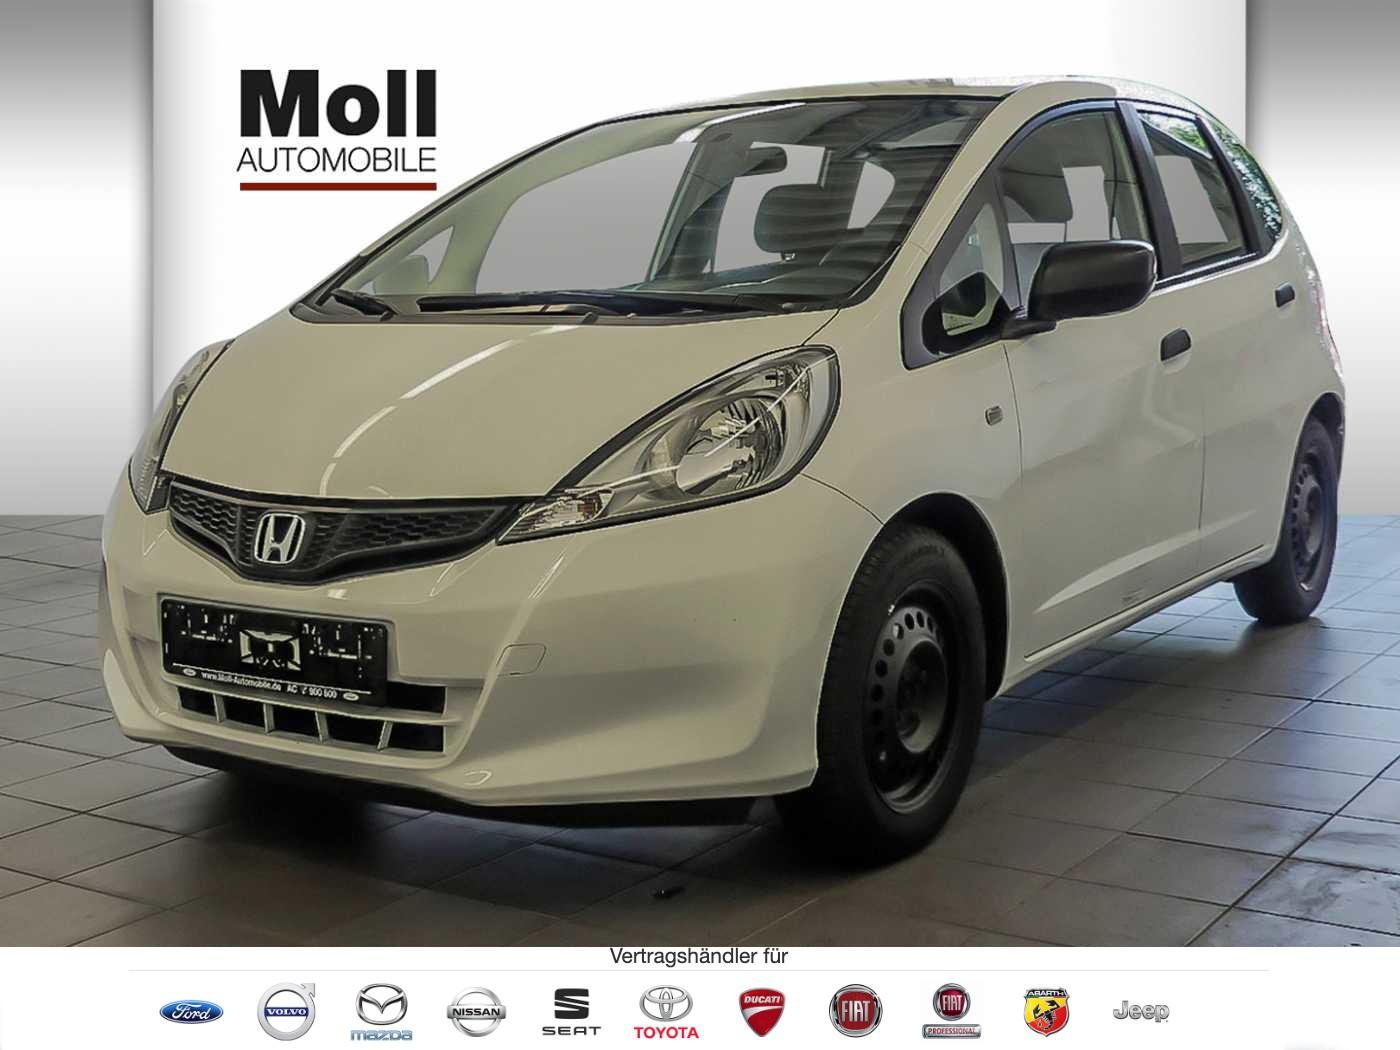 Honda Jazz 1.2 i-VTEC Cool Klima, Jahr 2013, petrol